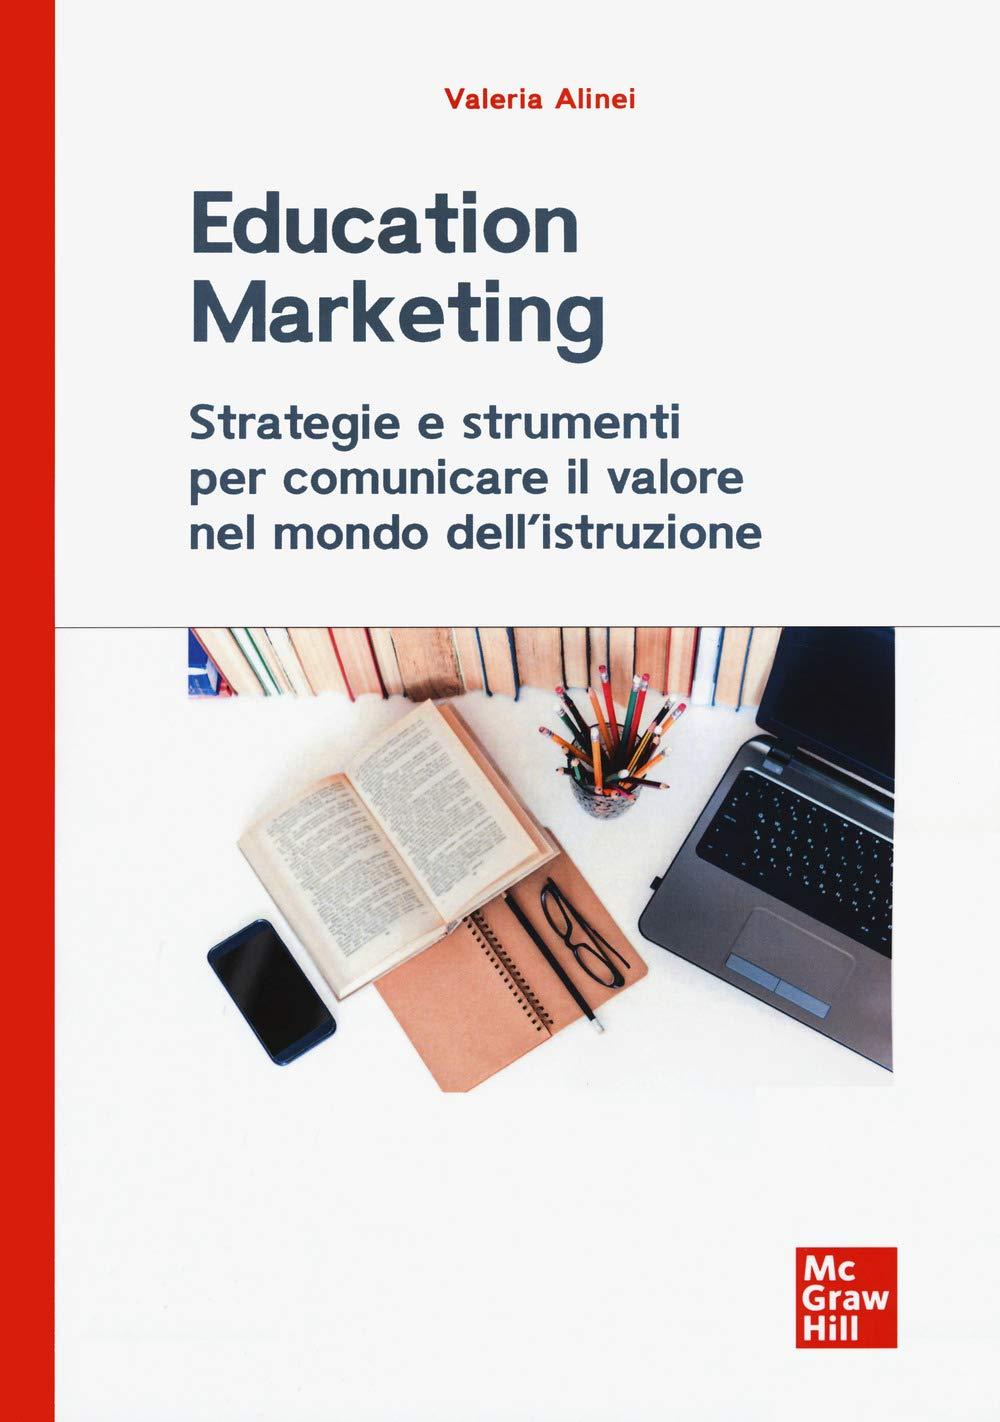 education marketing valeria alinei